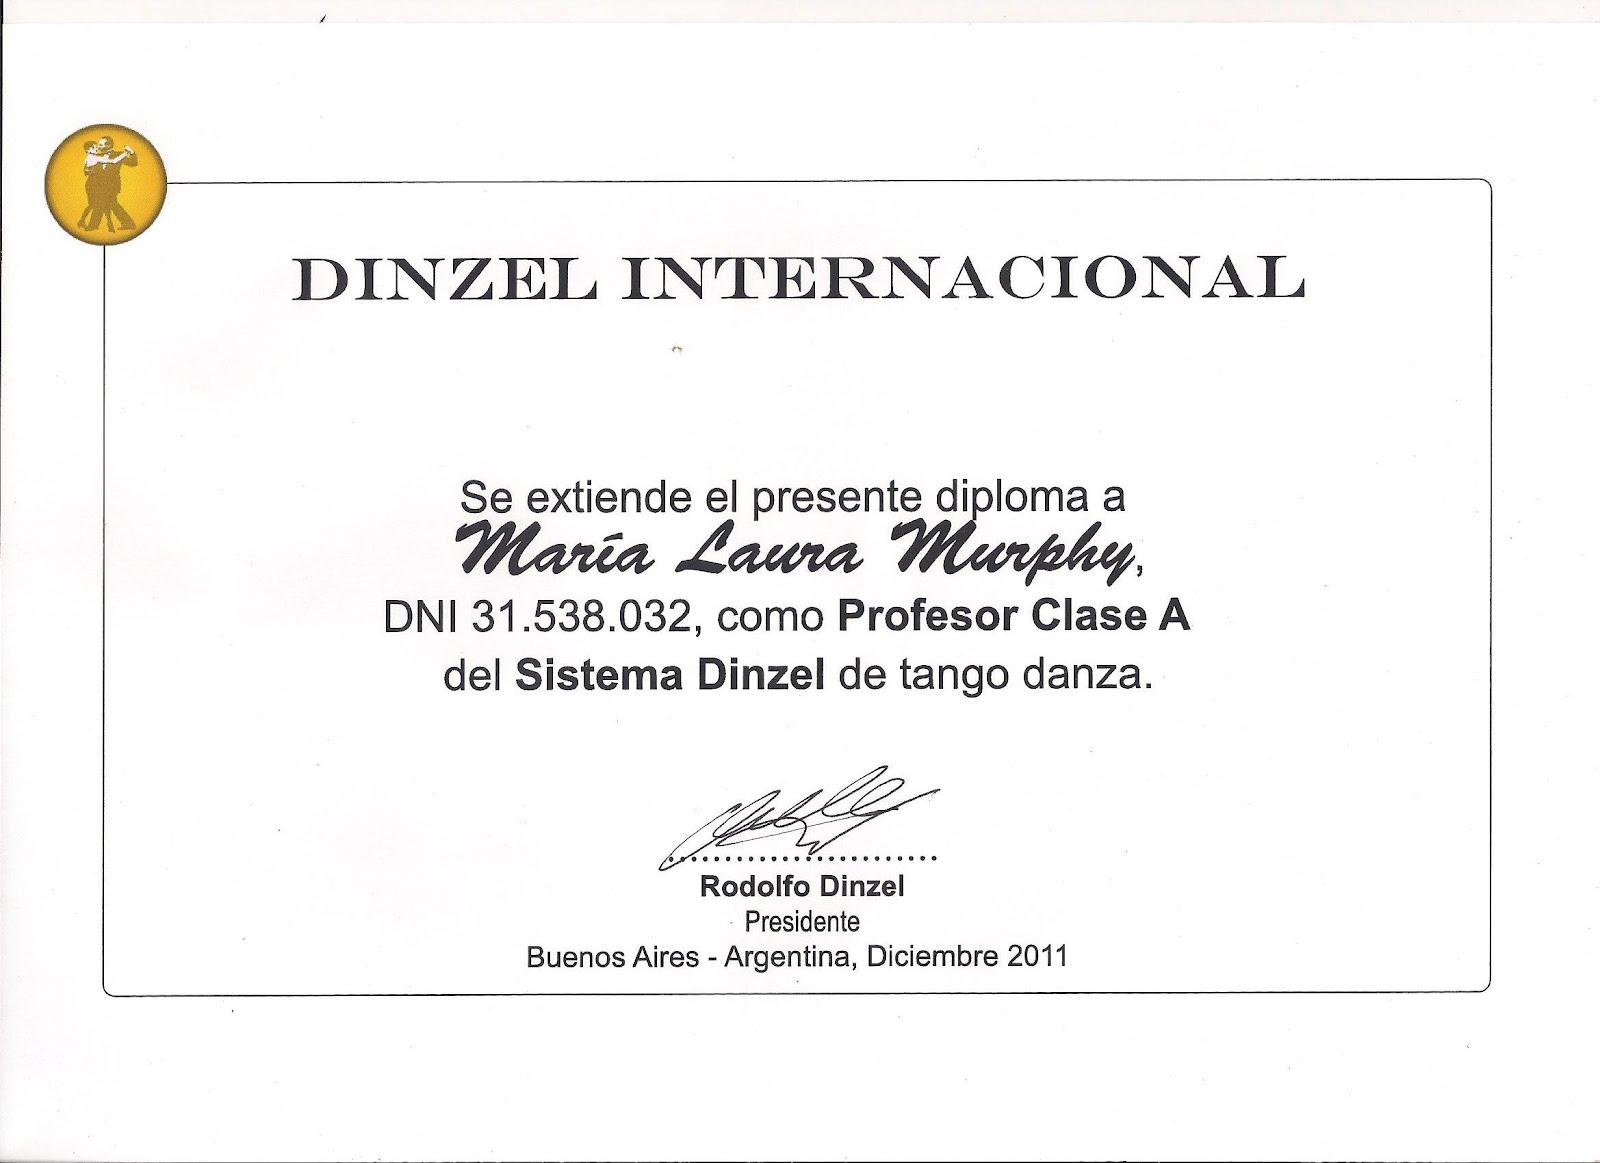 DINZEL INTERNACIONAL